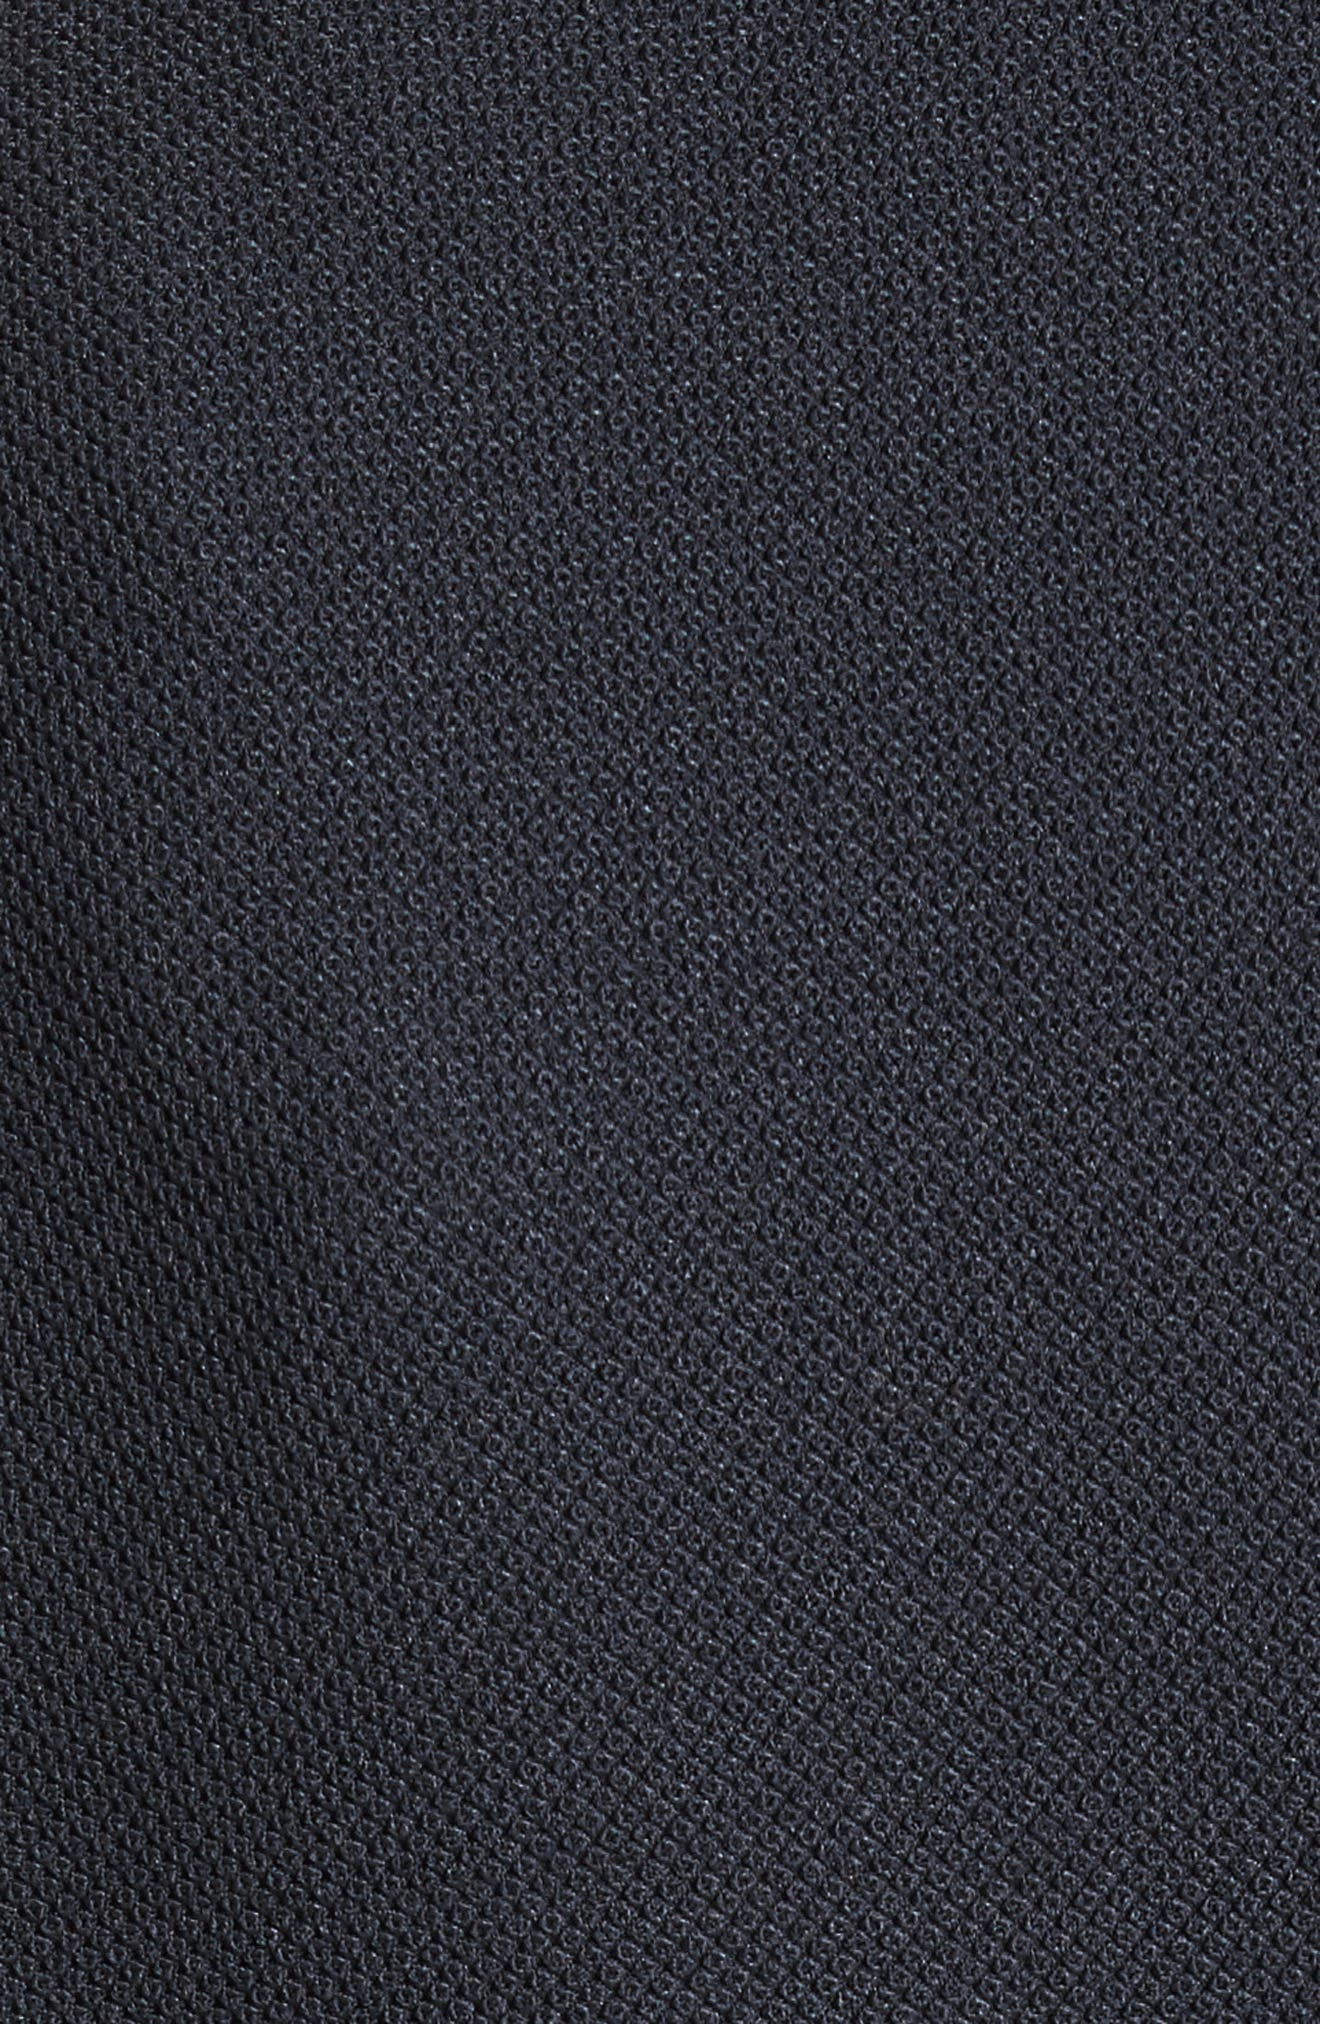 Armani Jeans Piqué Double Breasted Blazer,                             Alternate thumbnail 6, color,                             484